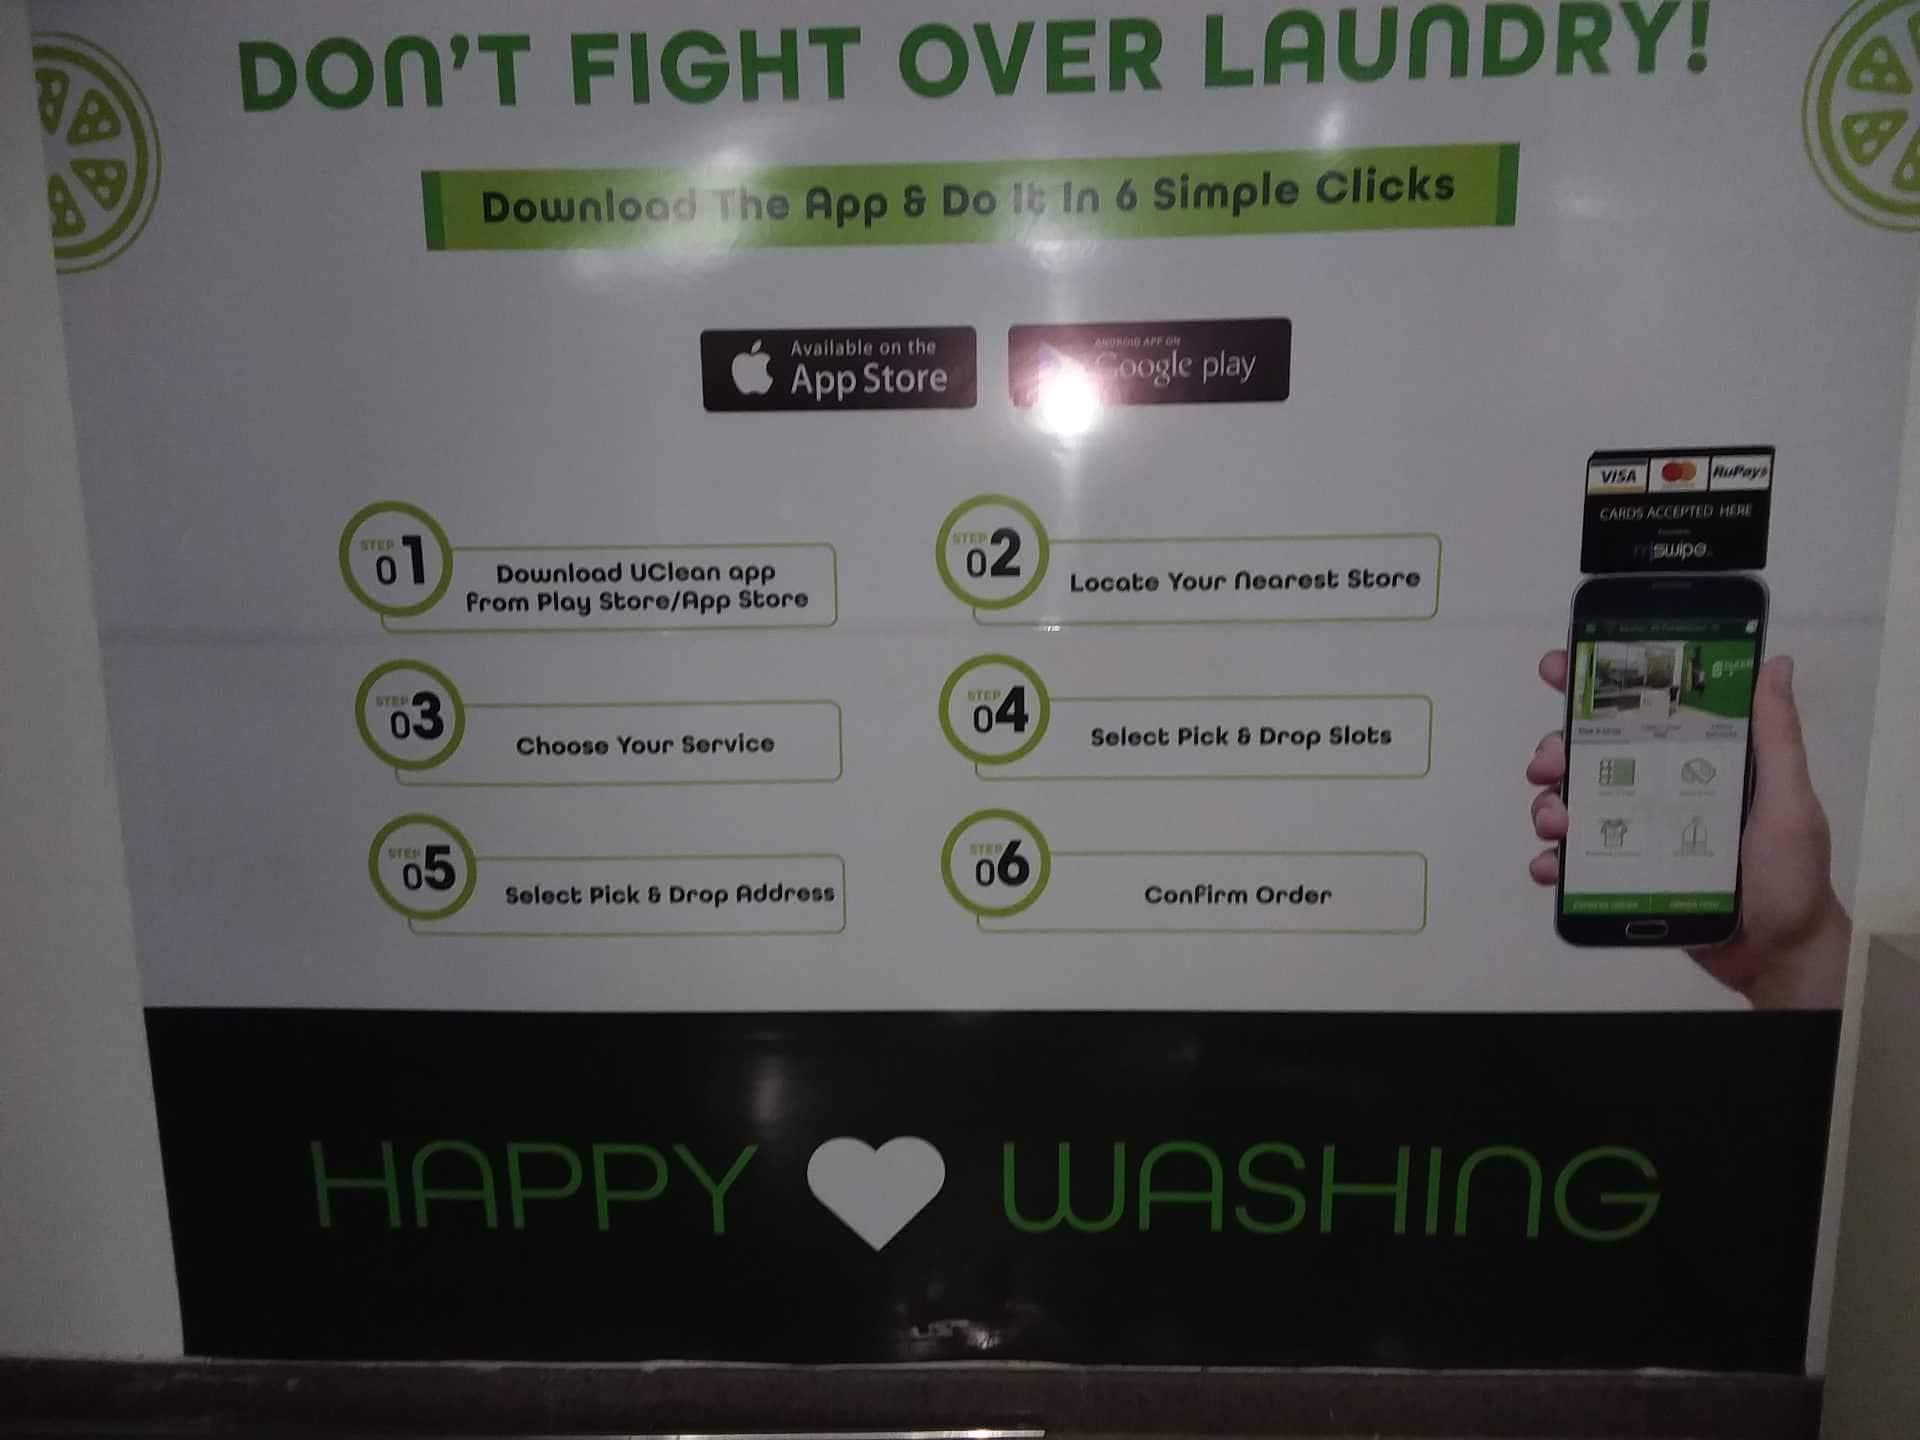 Top Kilogram Laundry Services in Swaroop Nagar - Best